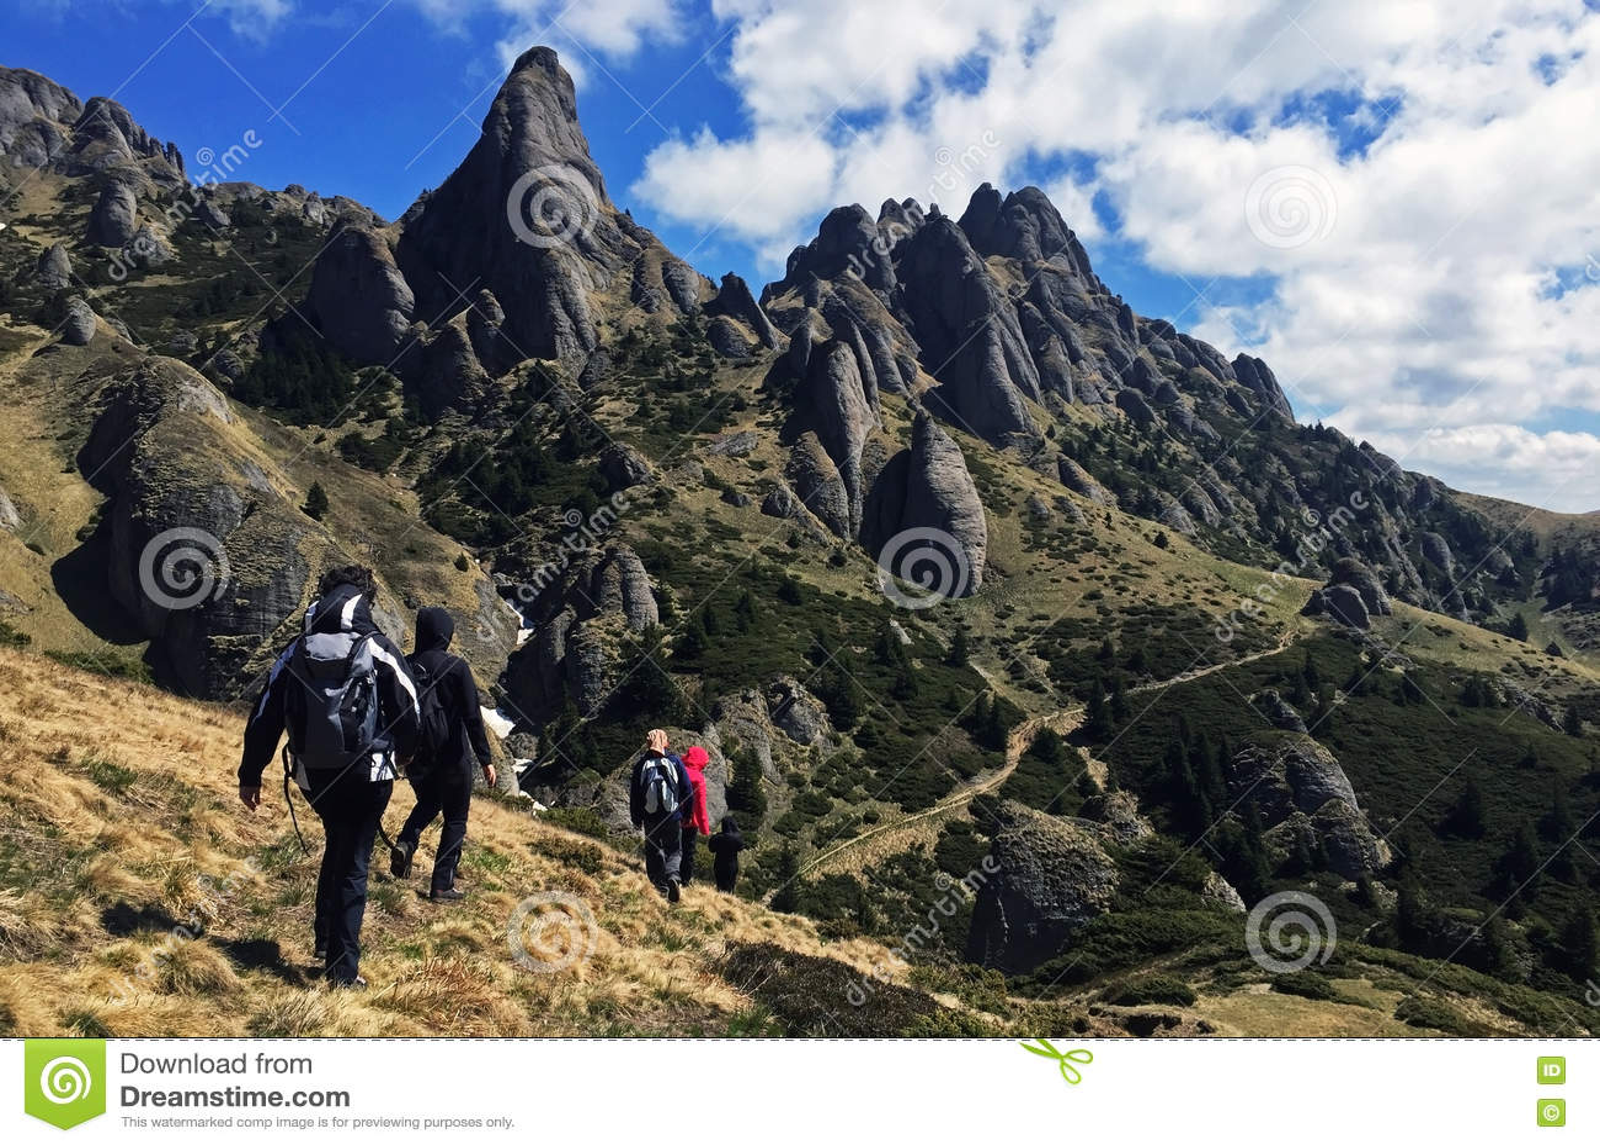 The beautiful Ciucas mountains in Romania